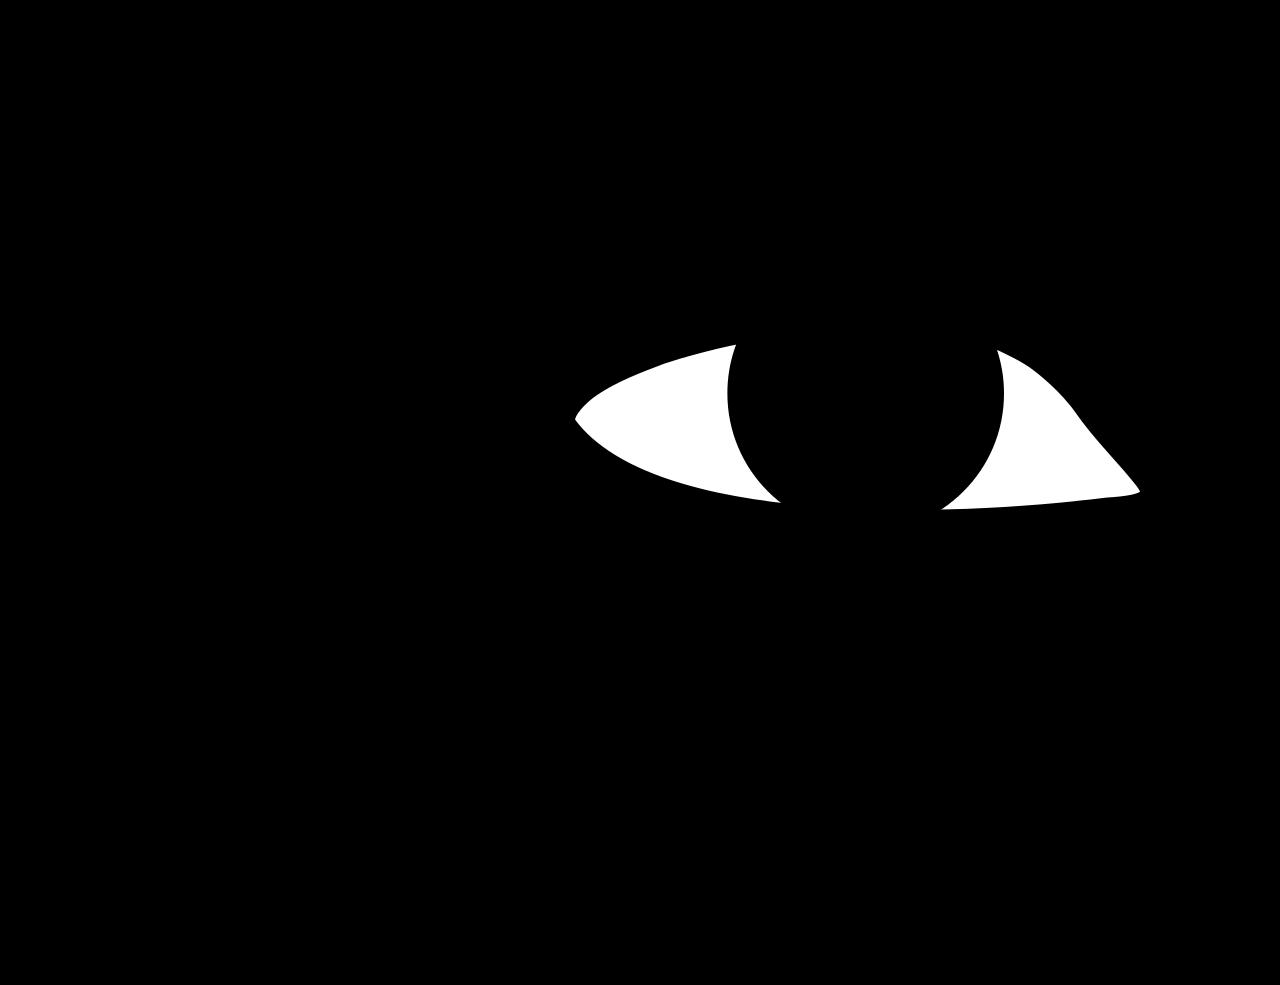 1280px Eye Of Horus Right Svg Png 1280 985 Eye Of Horus Horus Tattoo Egypt Tattoo